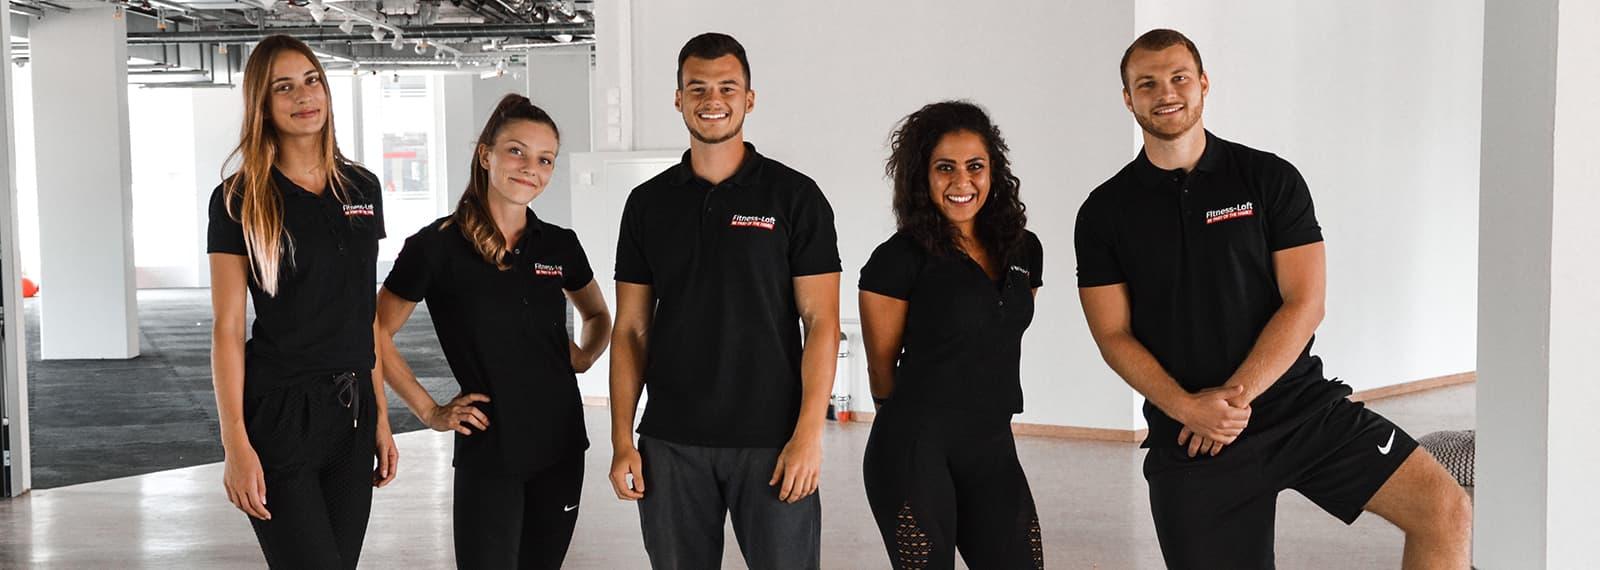 Trainer*innen Fitness-Loft be part of the family